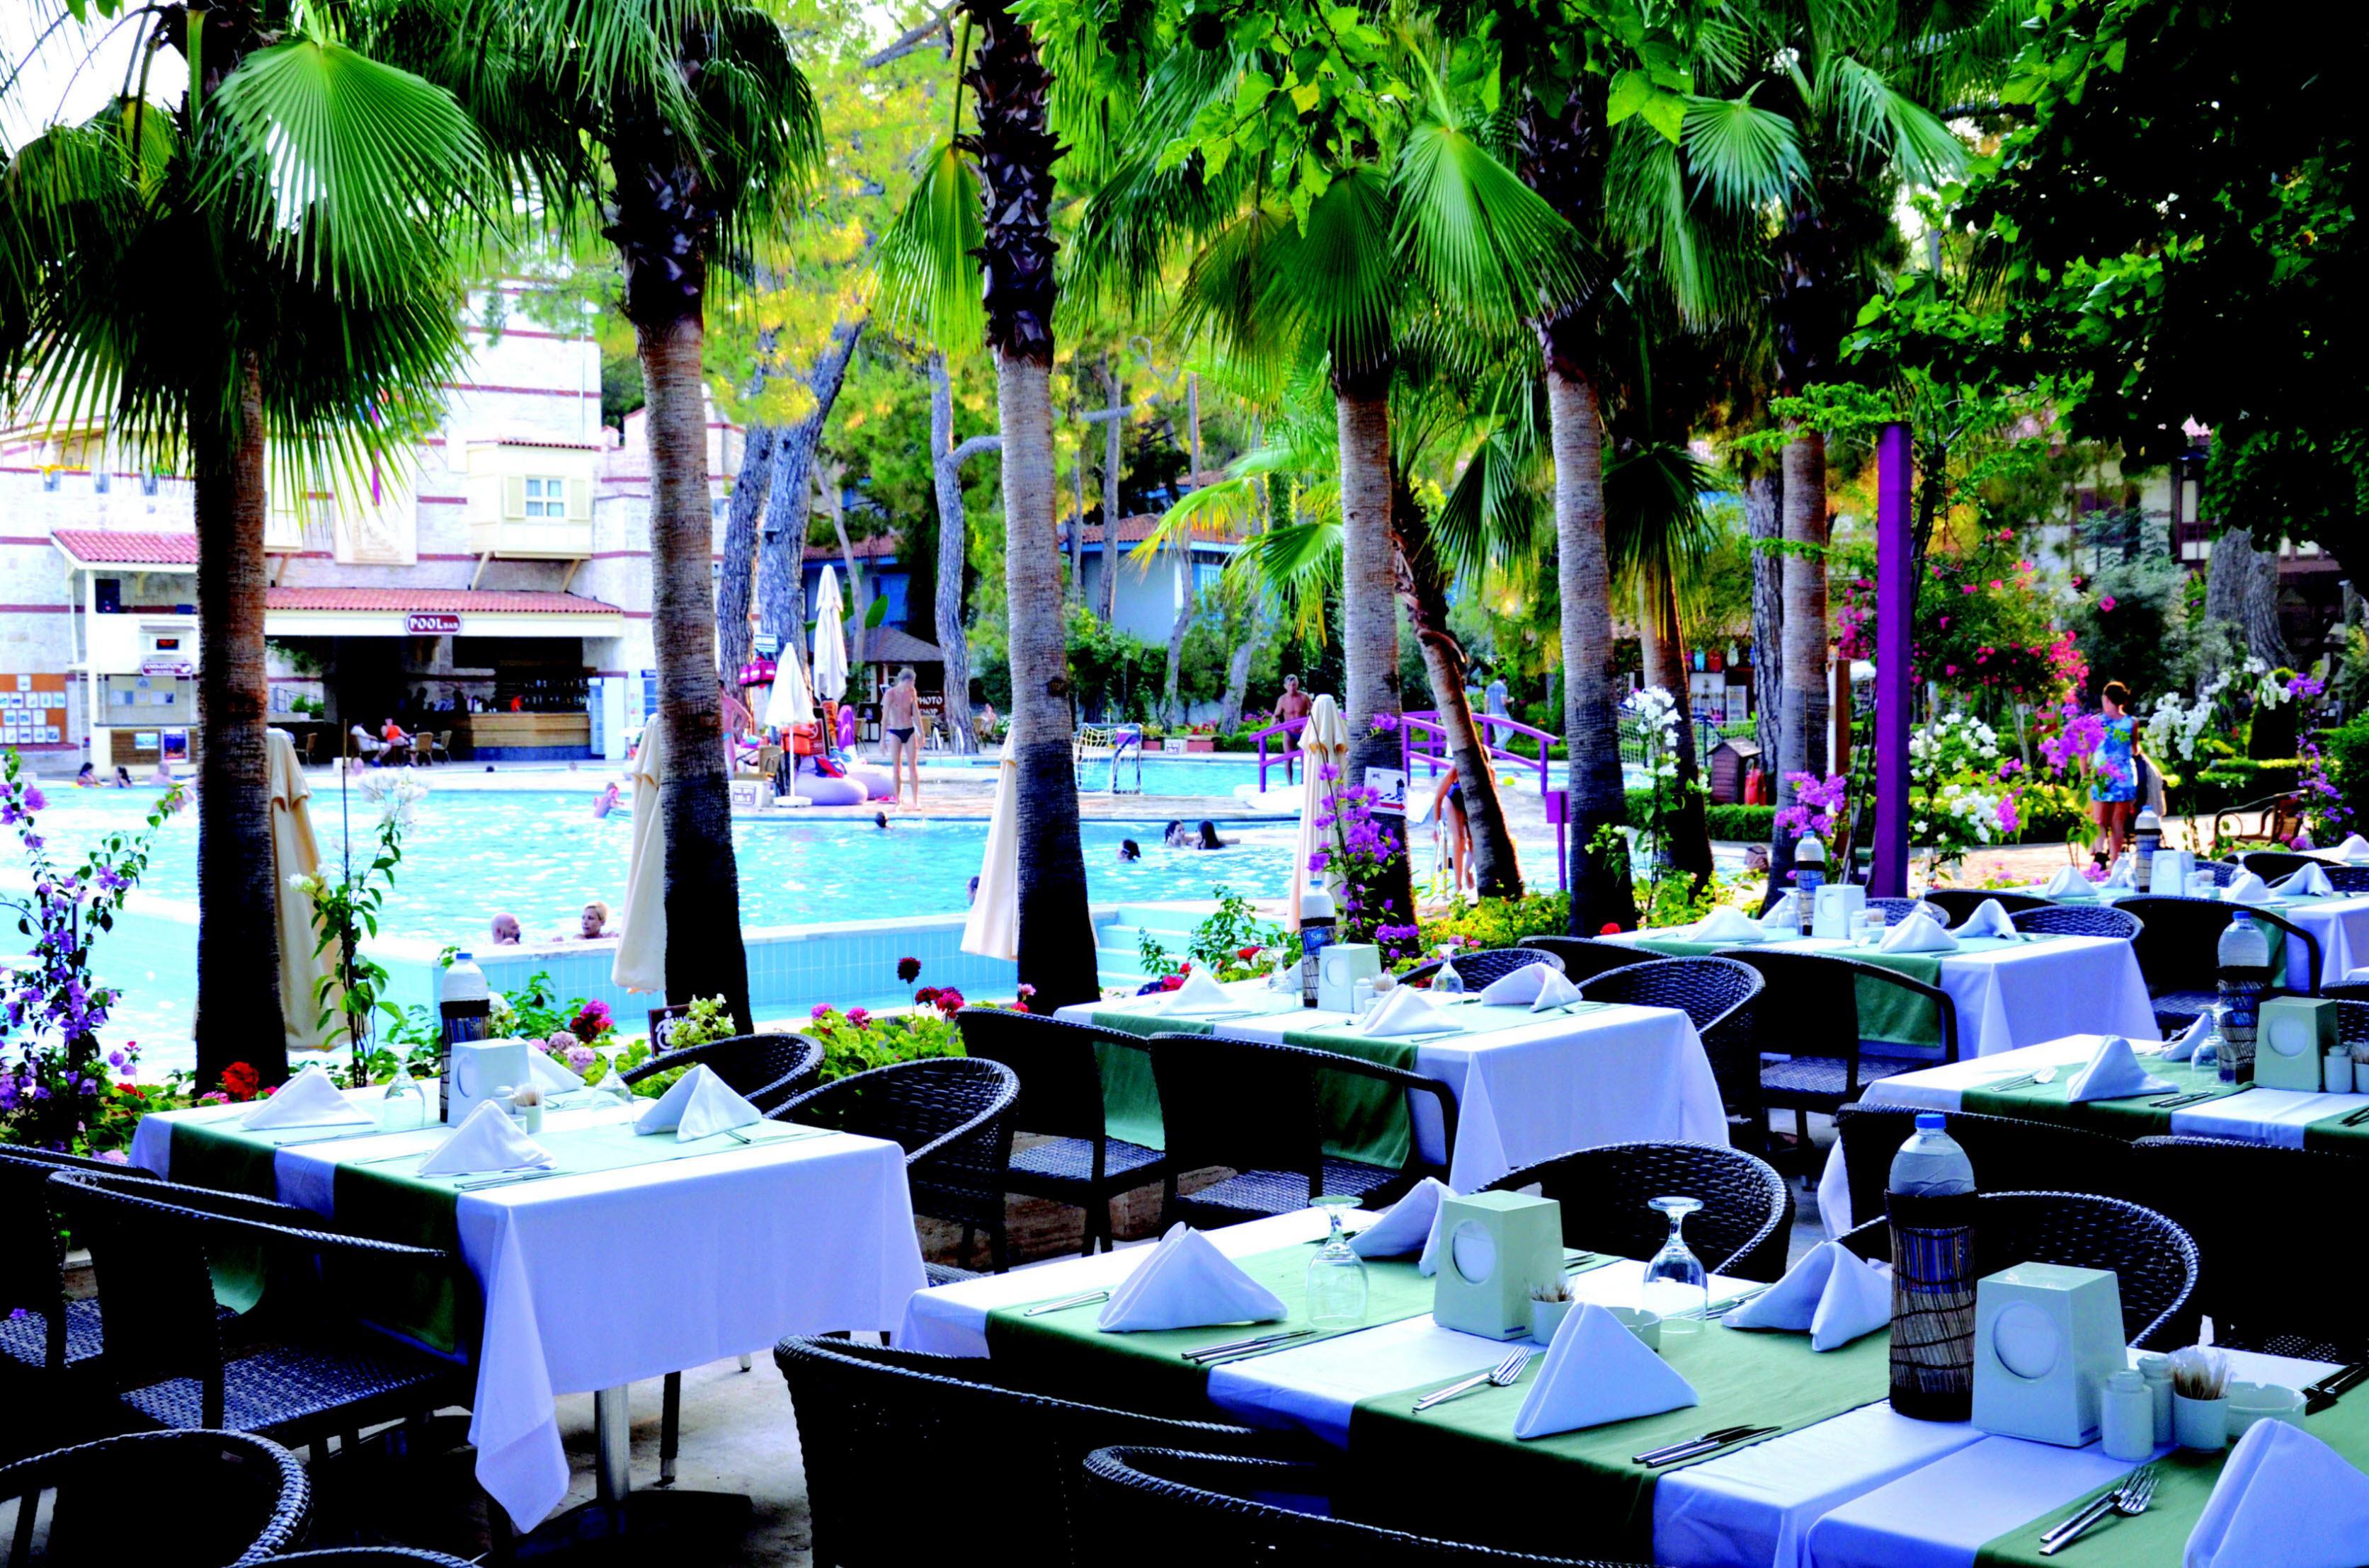 http://www.orextravel.sk/OREX/hotelphotos/ulusoy-kemer-holiday-club-area-0030.jpg